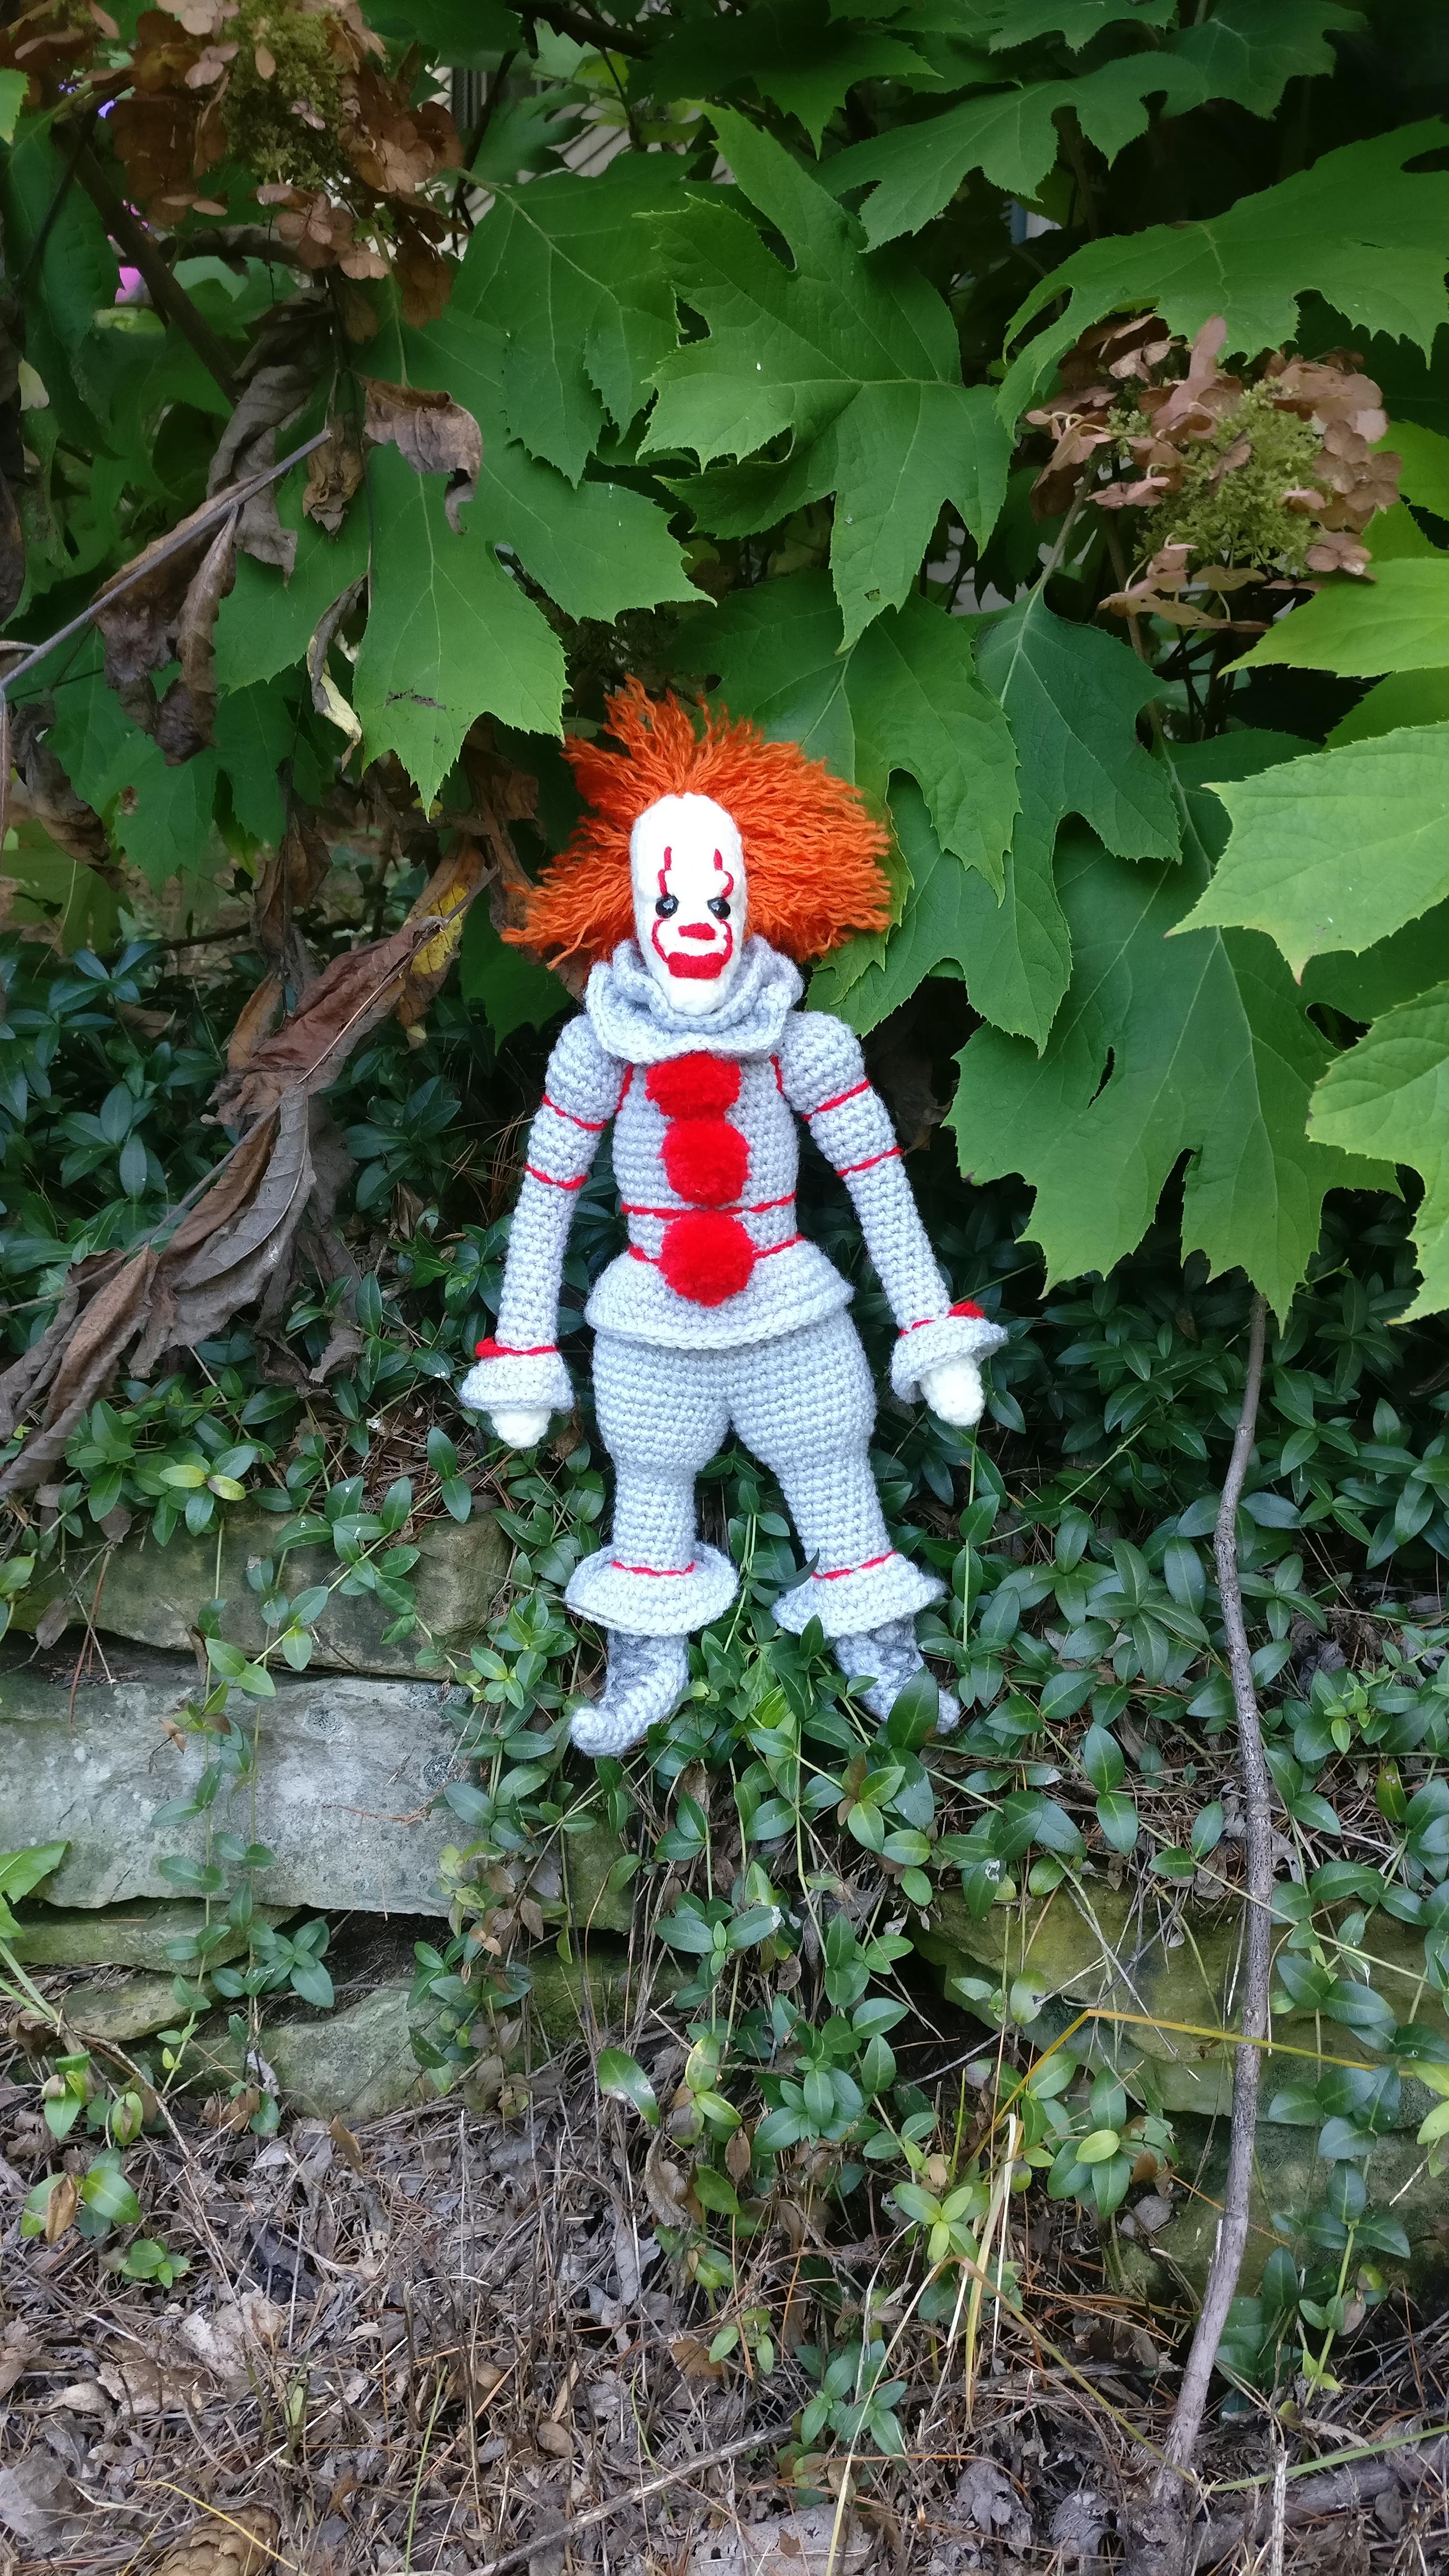 Clown da pauraaa free amigurumi free pattern schemi gratis amigurumi amigurumi free download